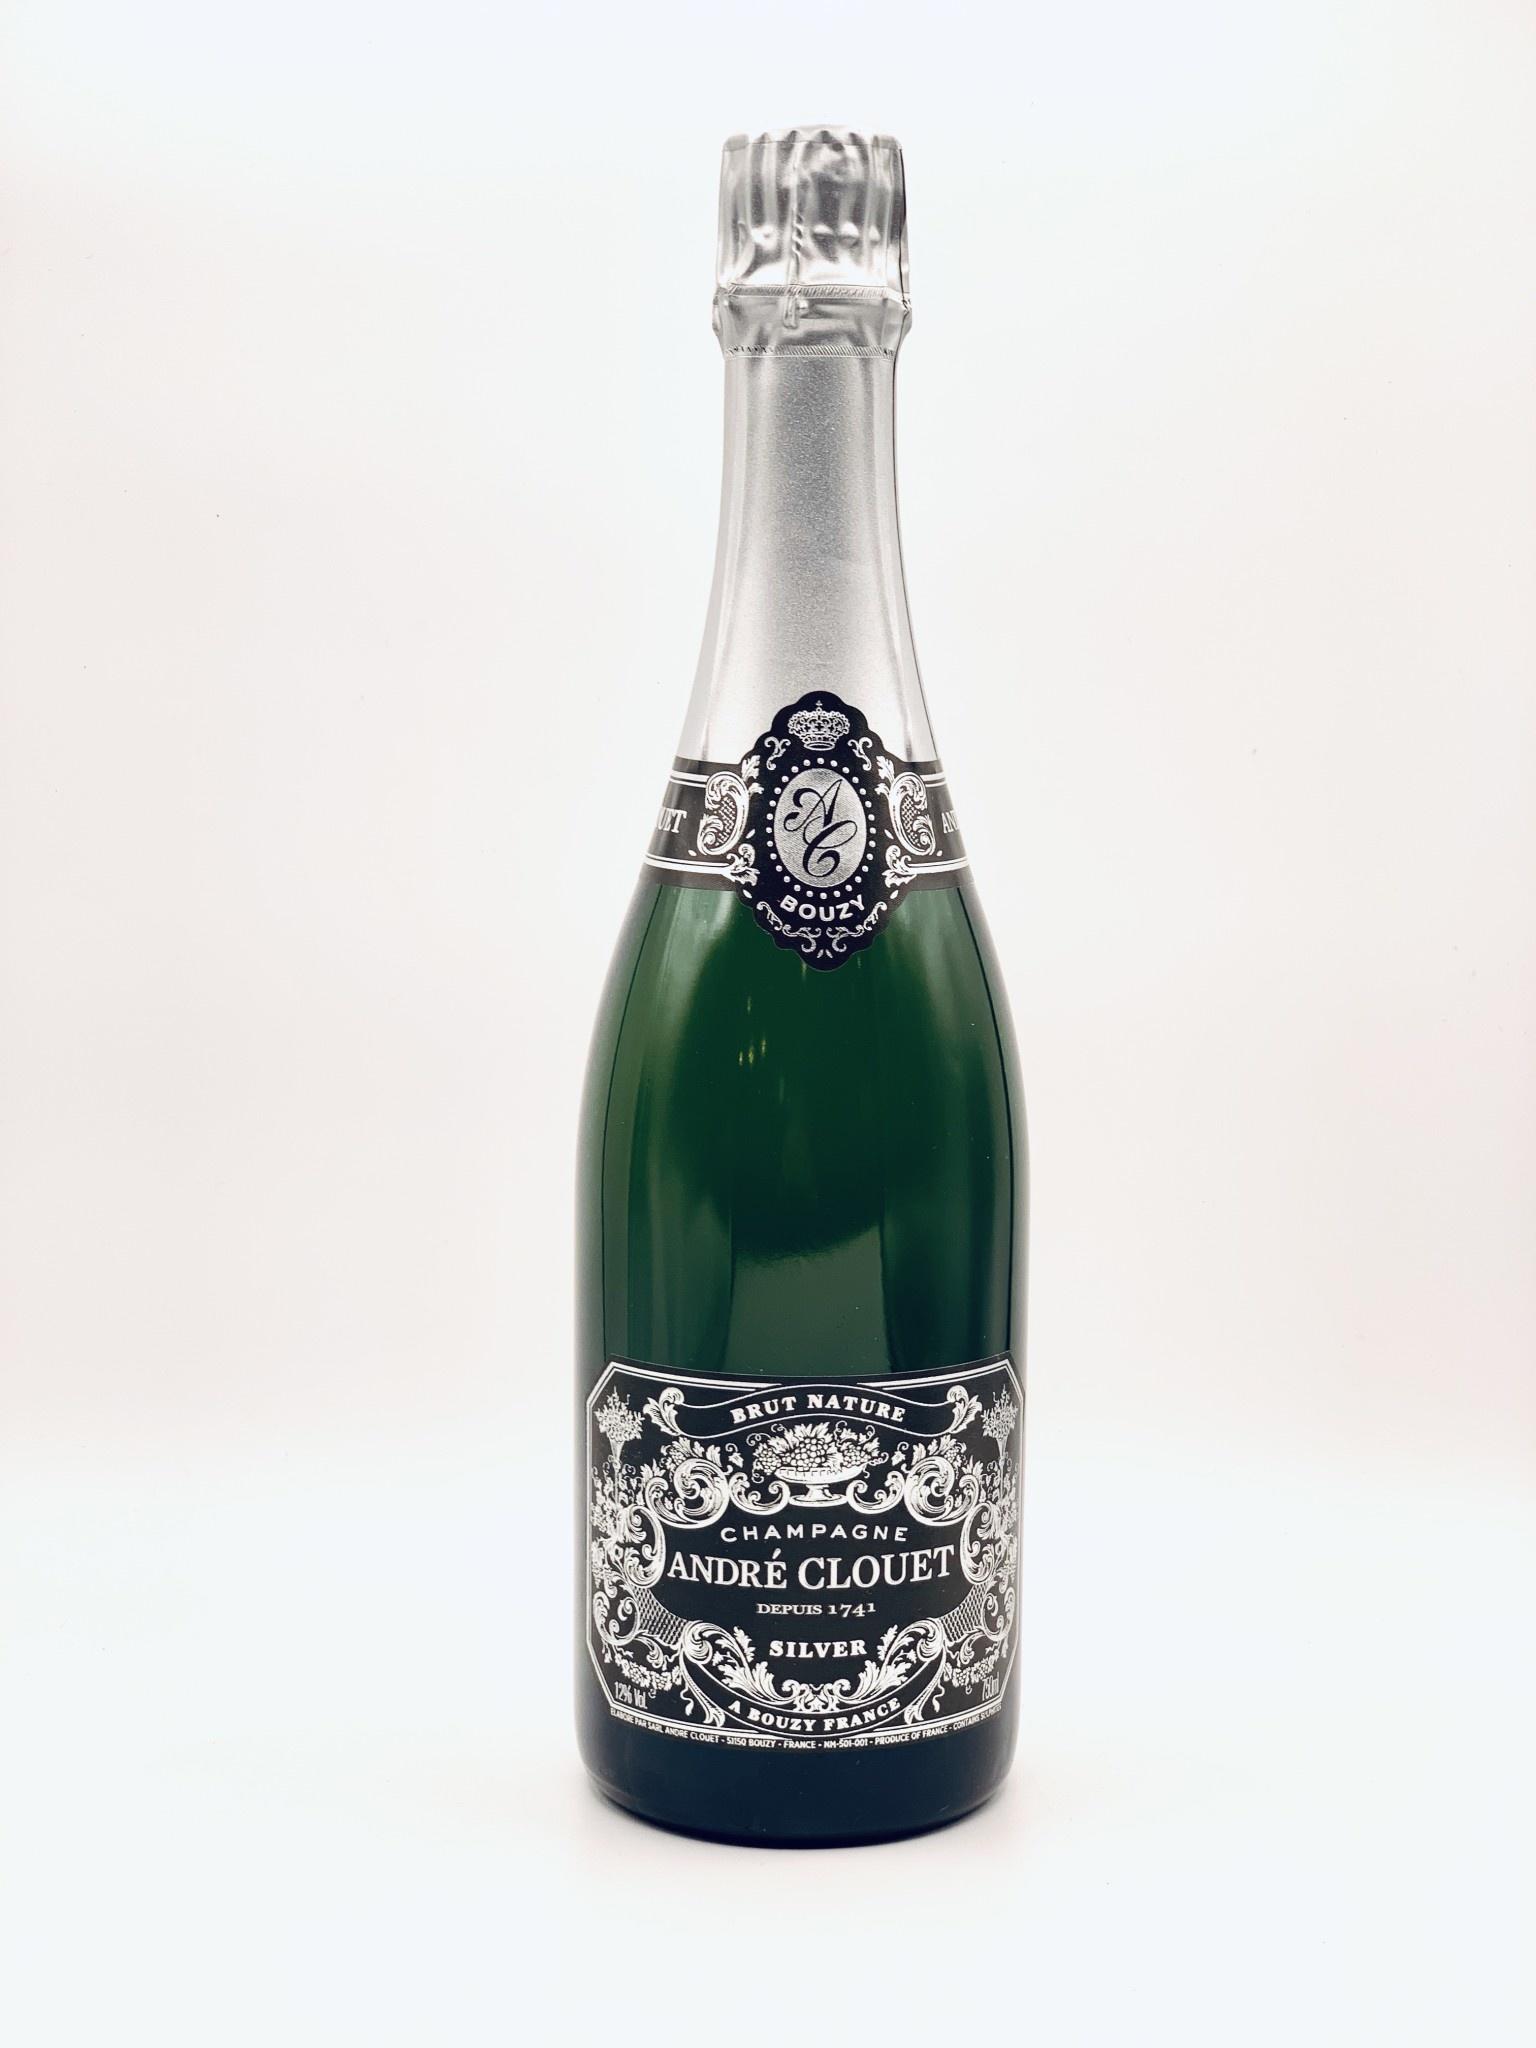 Champagne Brut Nature Grand Cru Blanc de Noir NV Andre Clouet Silver 750ml